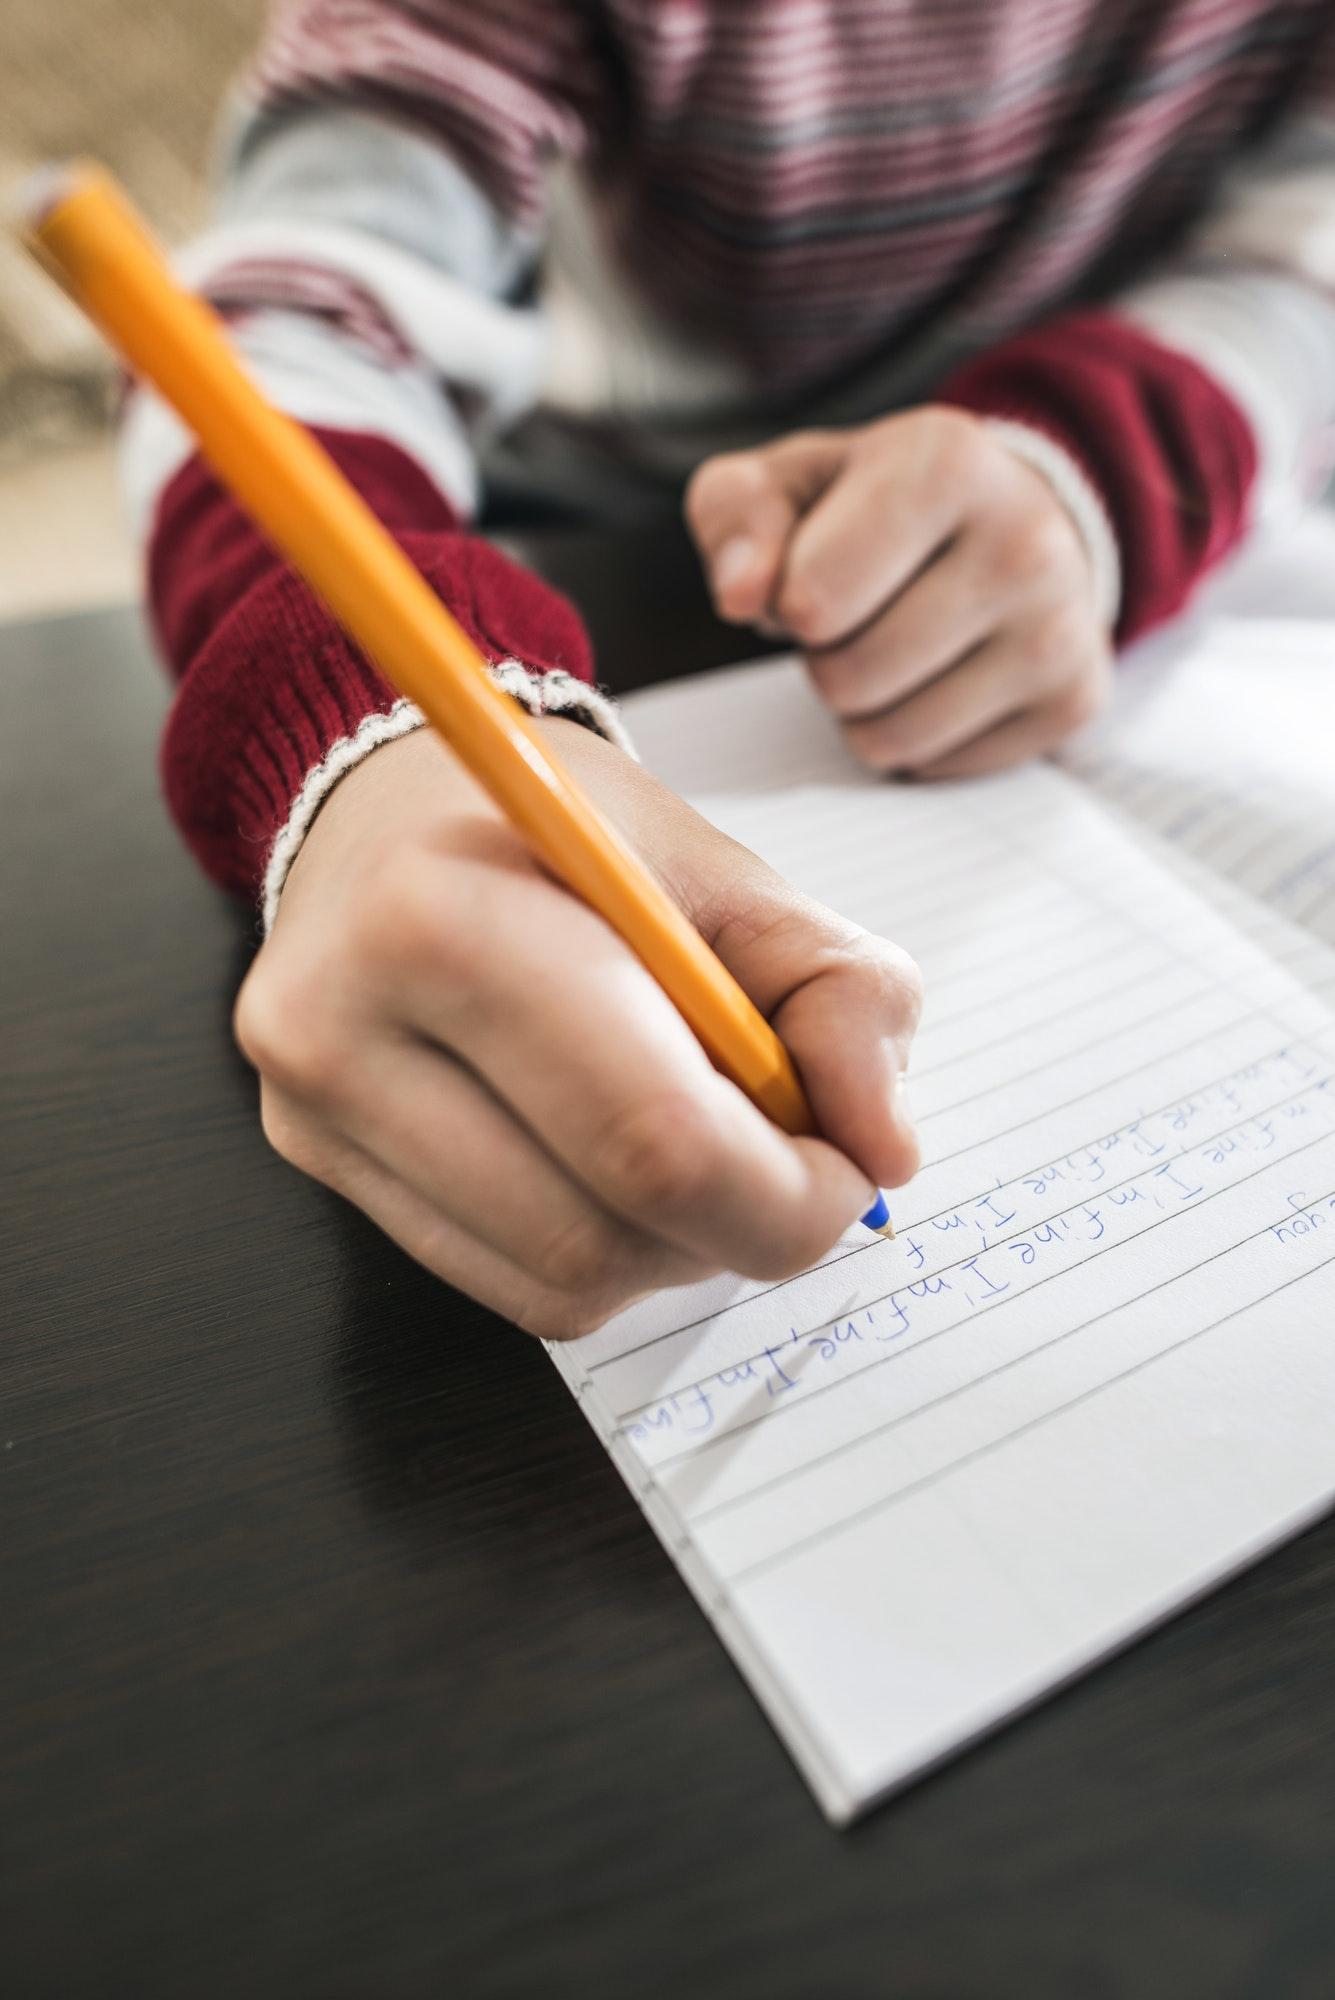 Child write in a notebook.